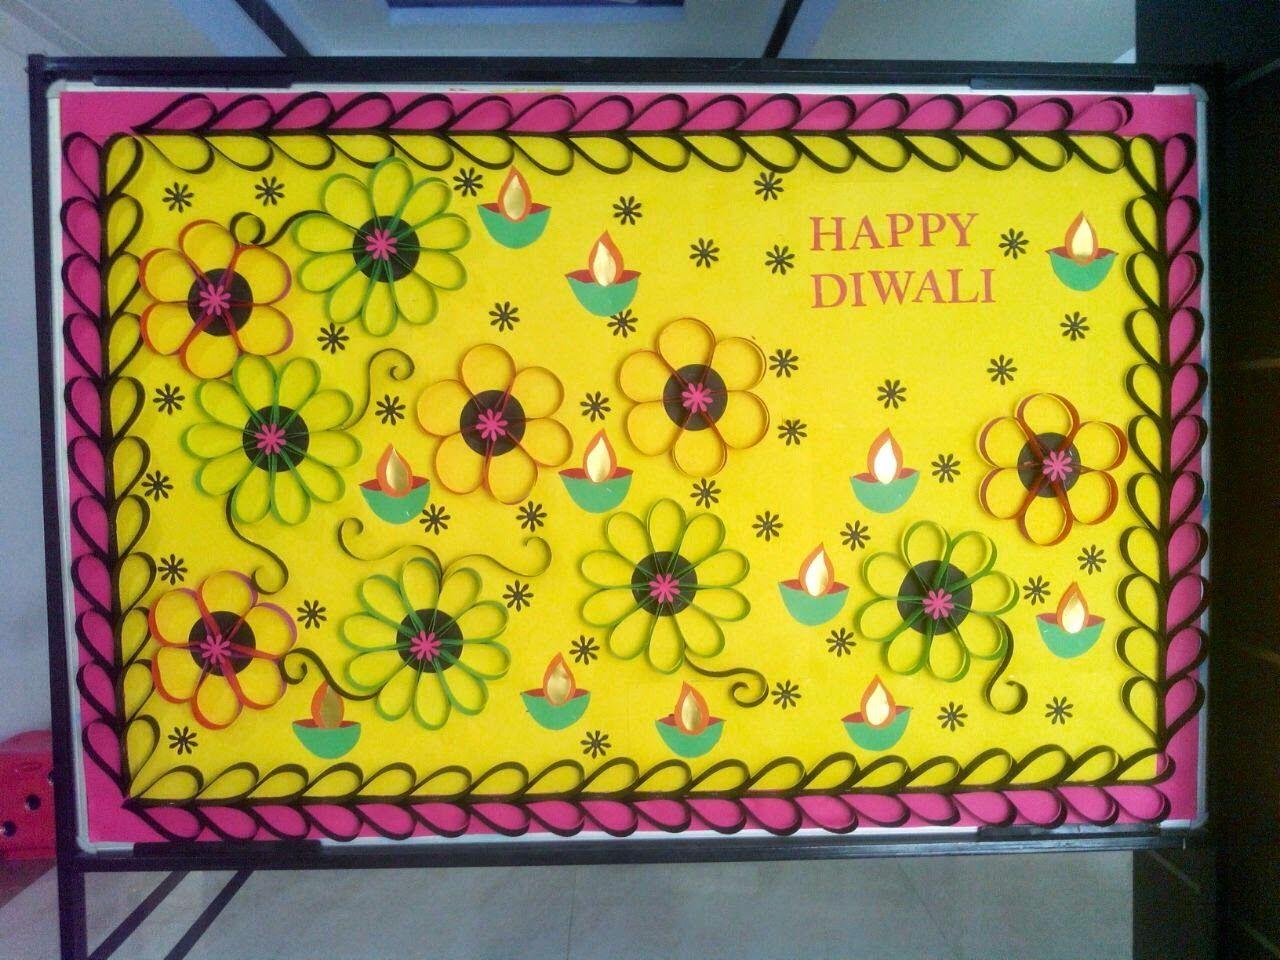 Art Craft Ideas And Bulletin Boards For Elementary Schools Happy Diwali Board